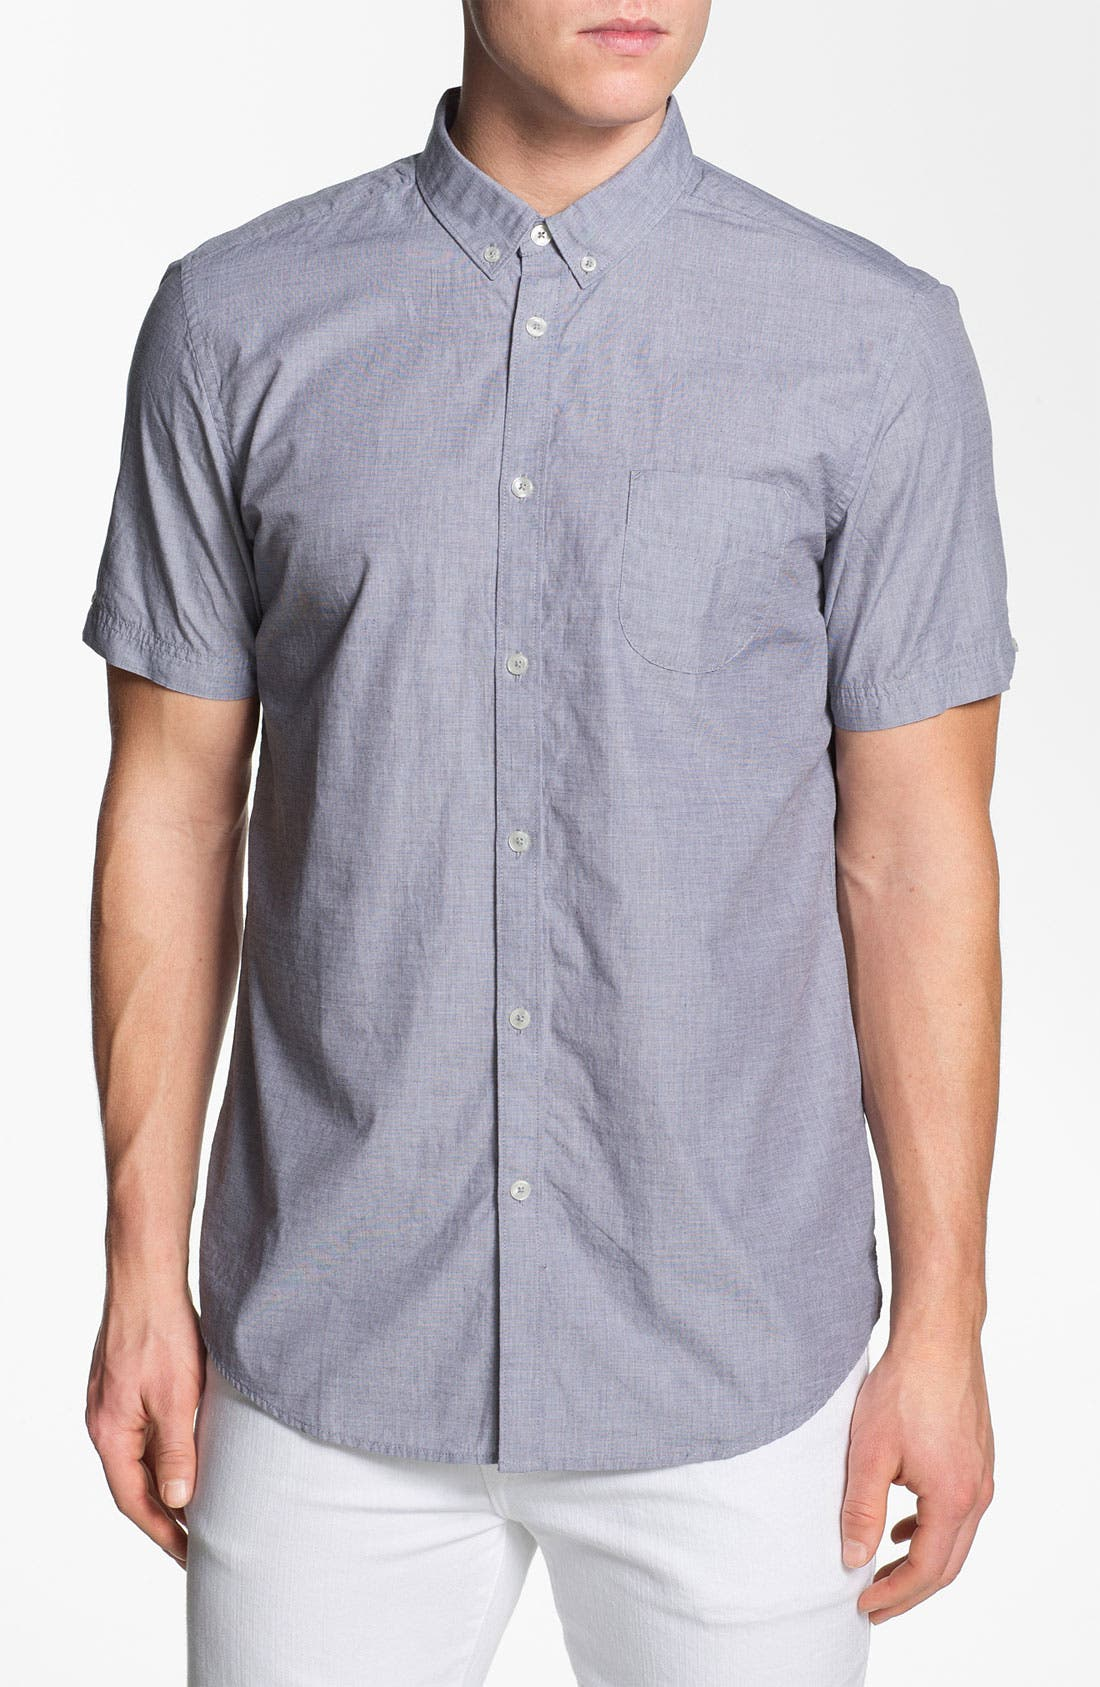 Alternate Image 1 Selected - Ben Sherman End on End Woven Shirt